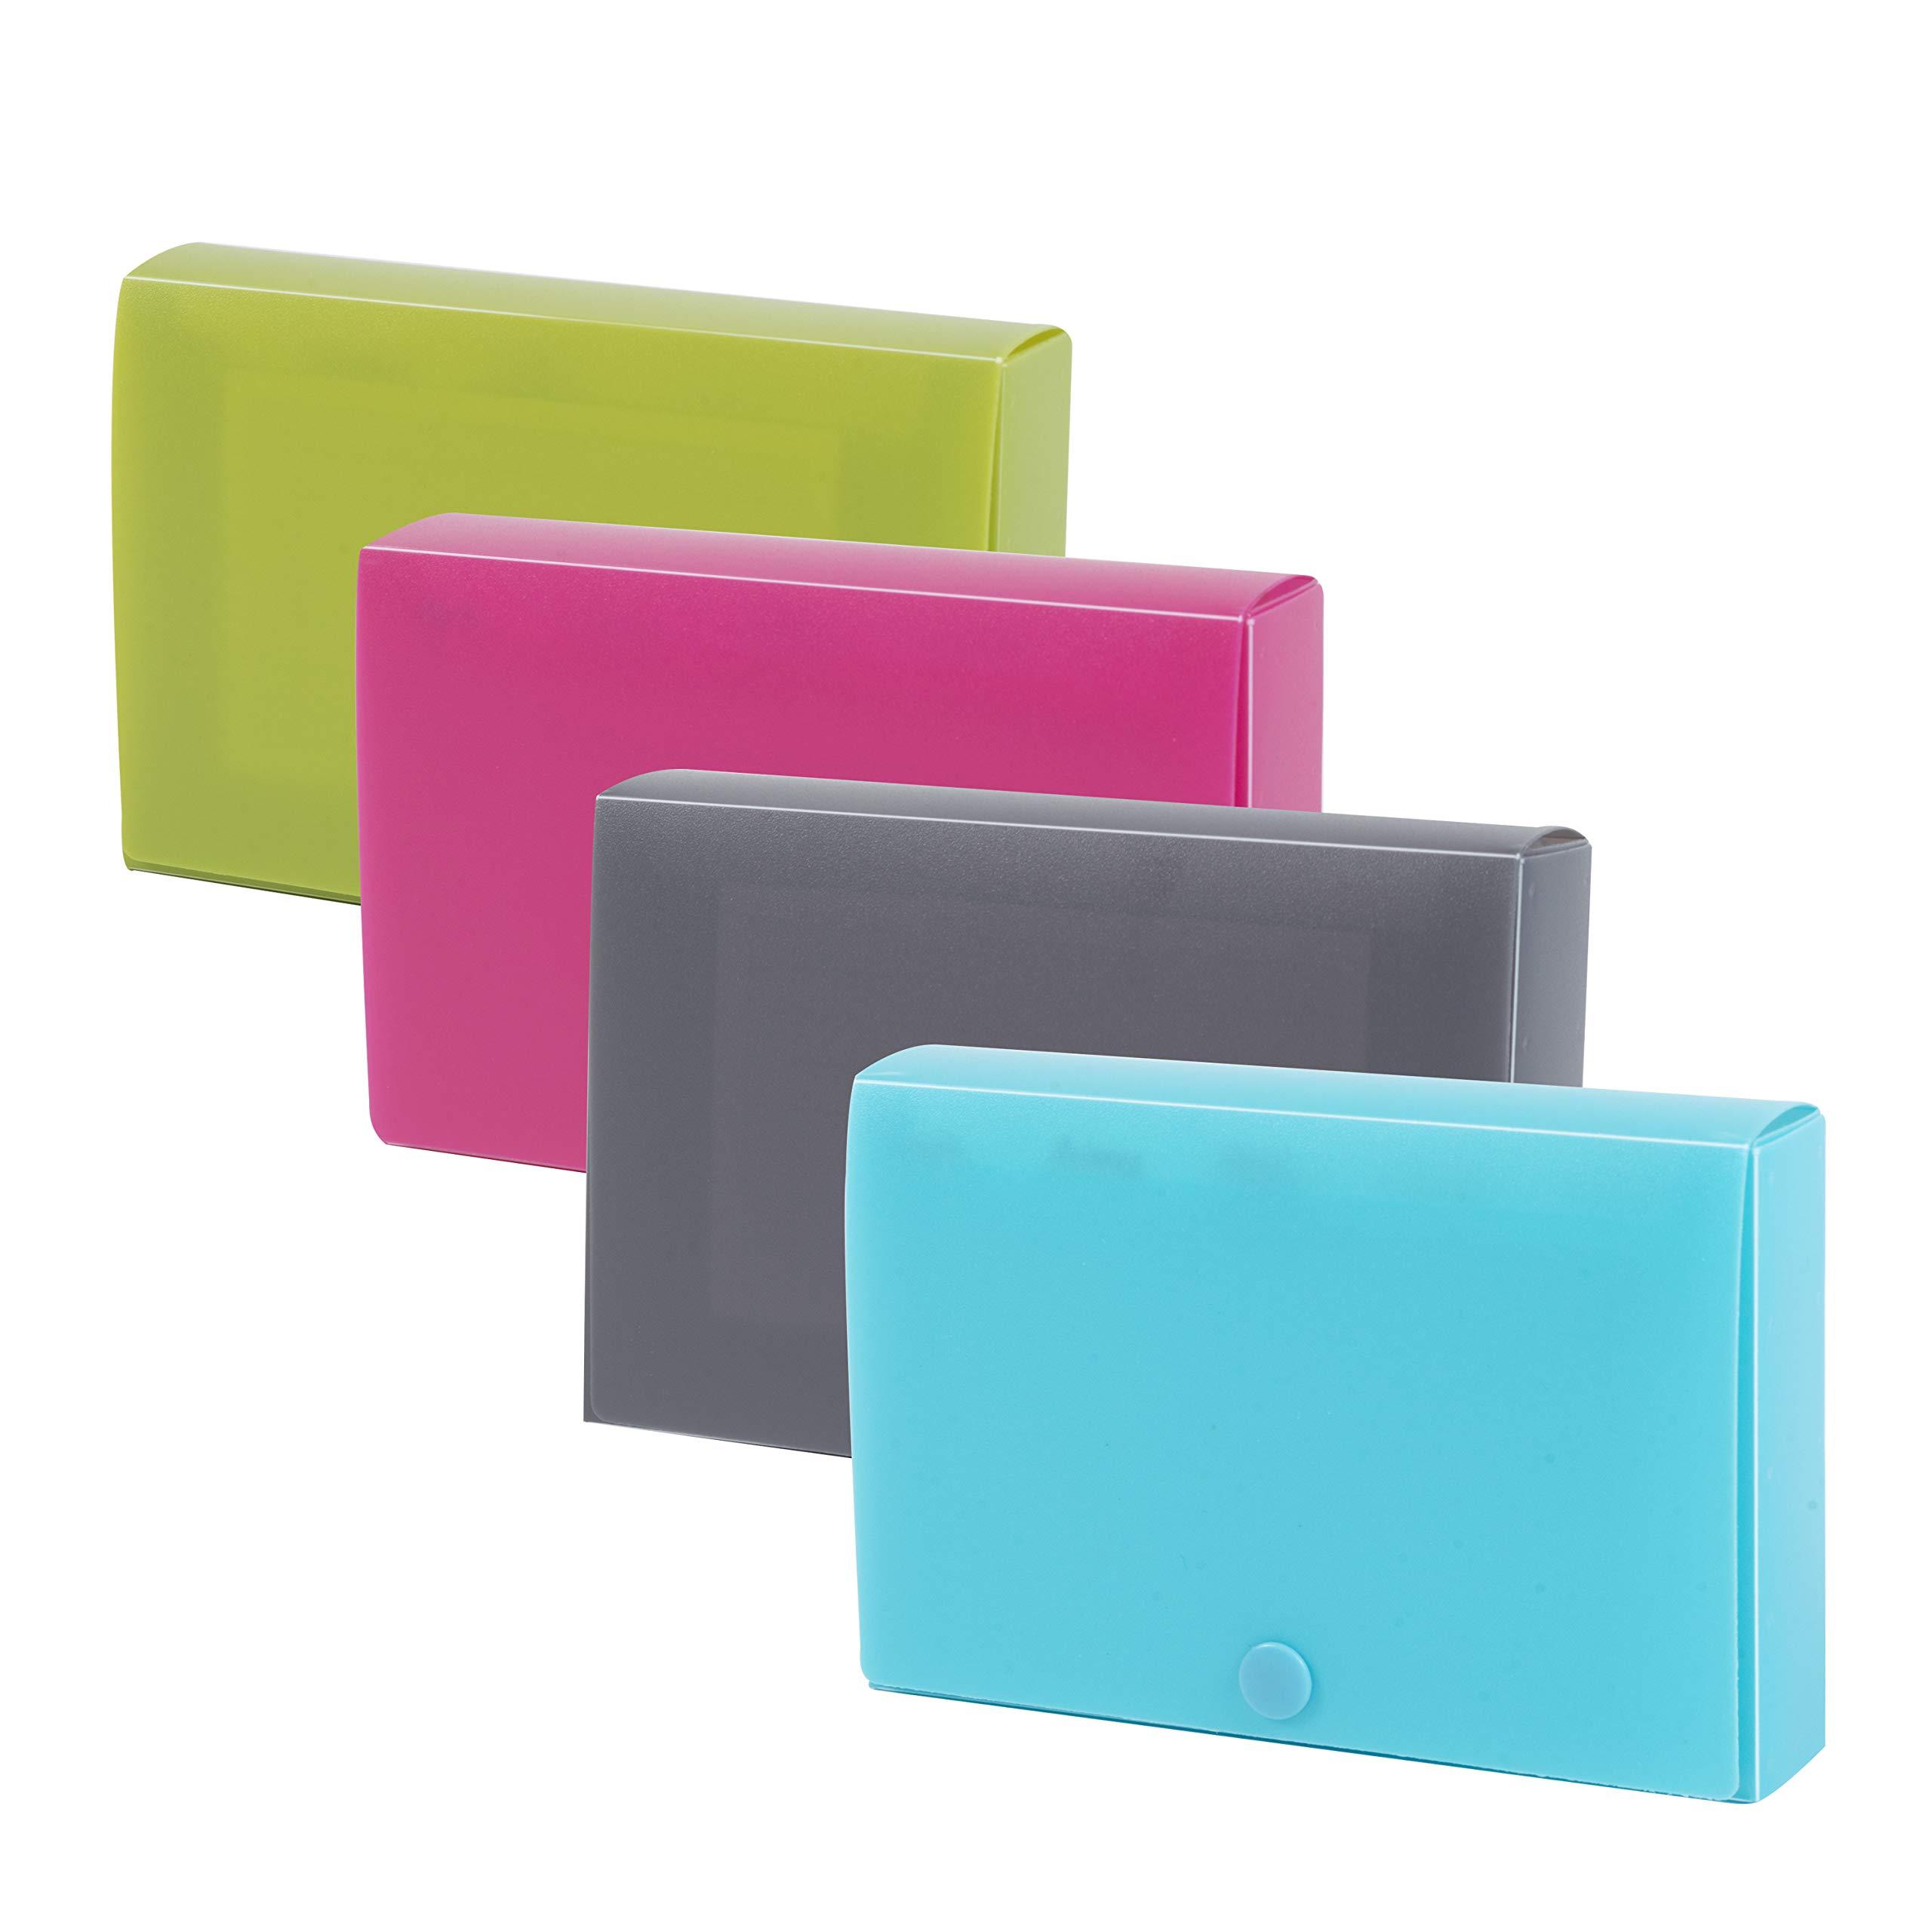 DocIt Index Card Holder 3'' x 5'' for Storing Recipe Cards, School Index Cards & More (4-Pack)